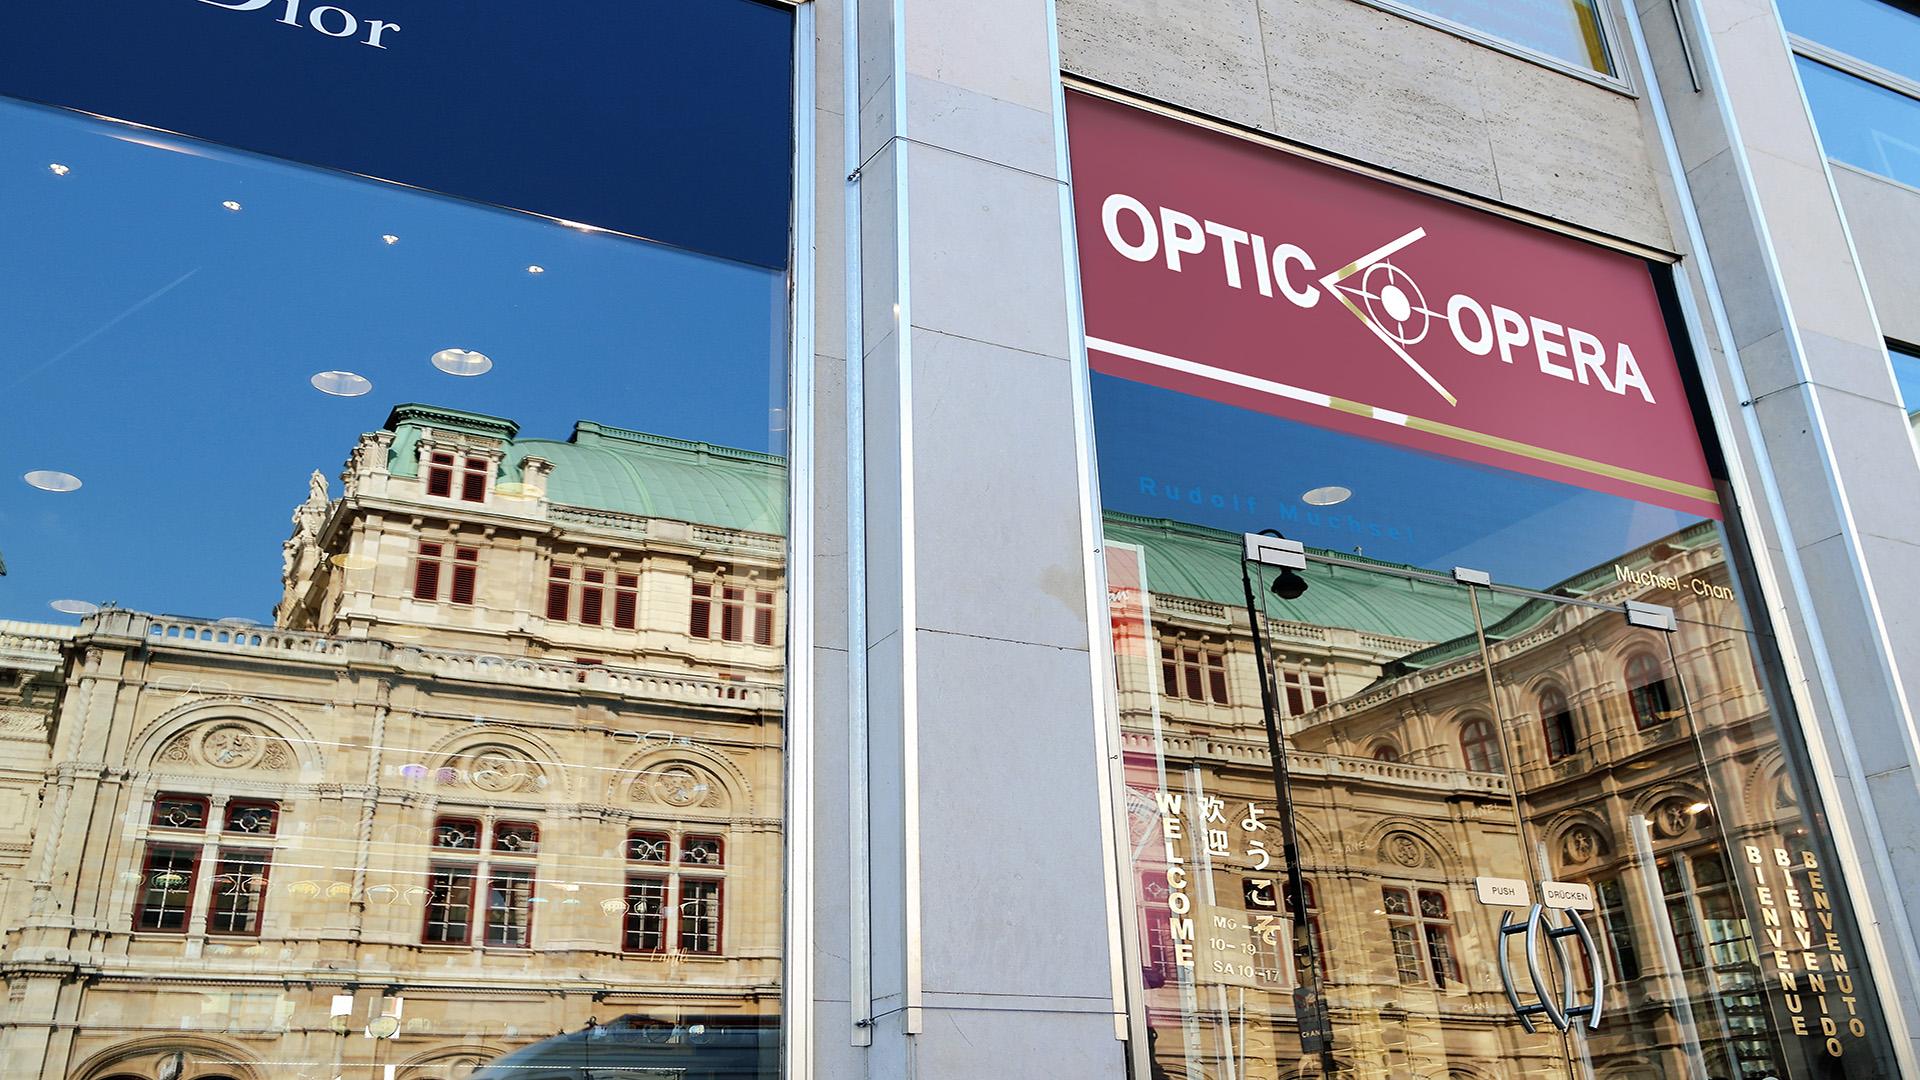 Optic Opera